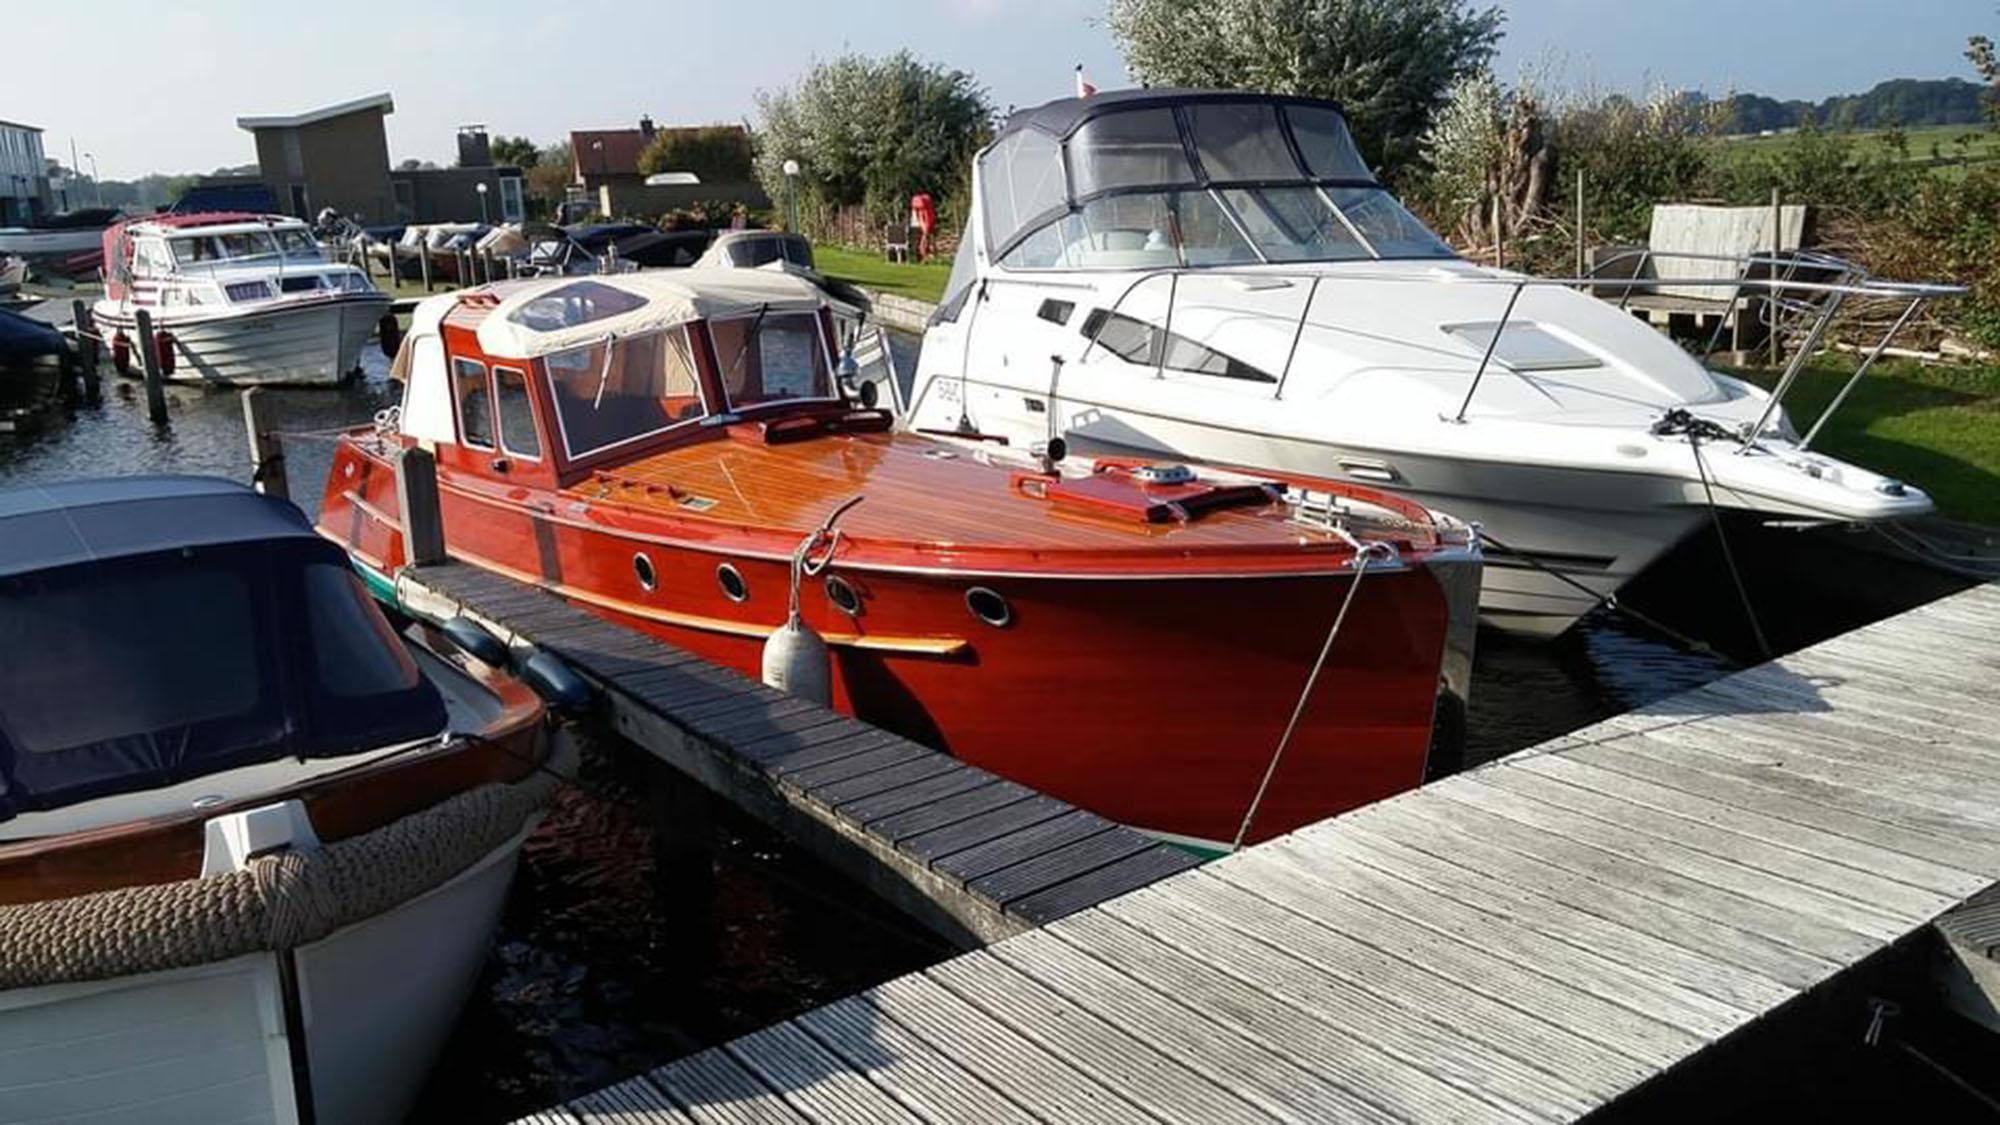 Jachtschilder Friesland-jacht-houten-boot-sloep-Coelan-bootlak-classic-yacht-painters-Hendrik Veltman5